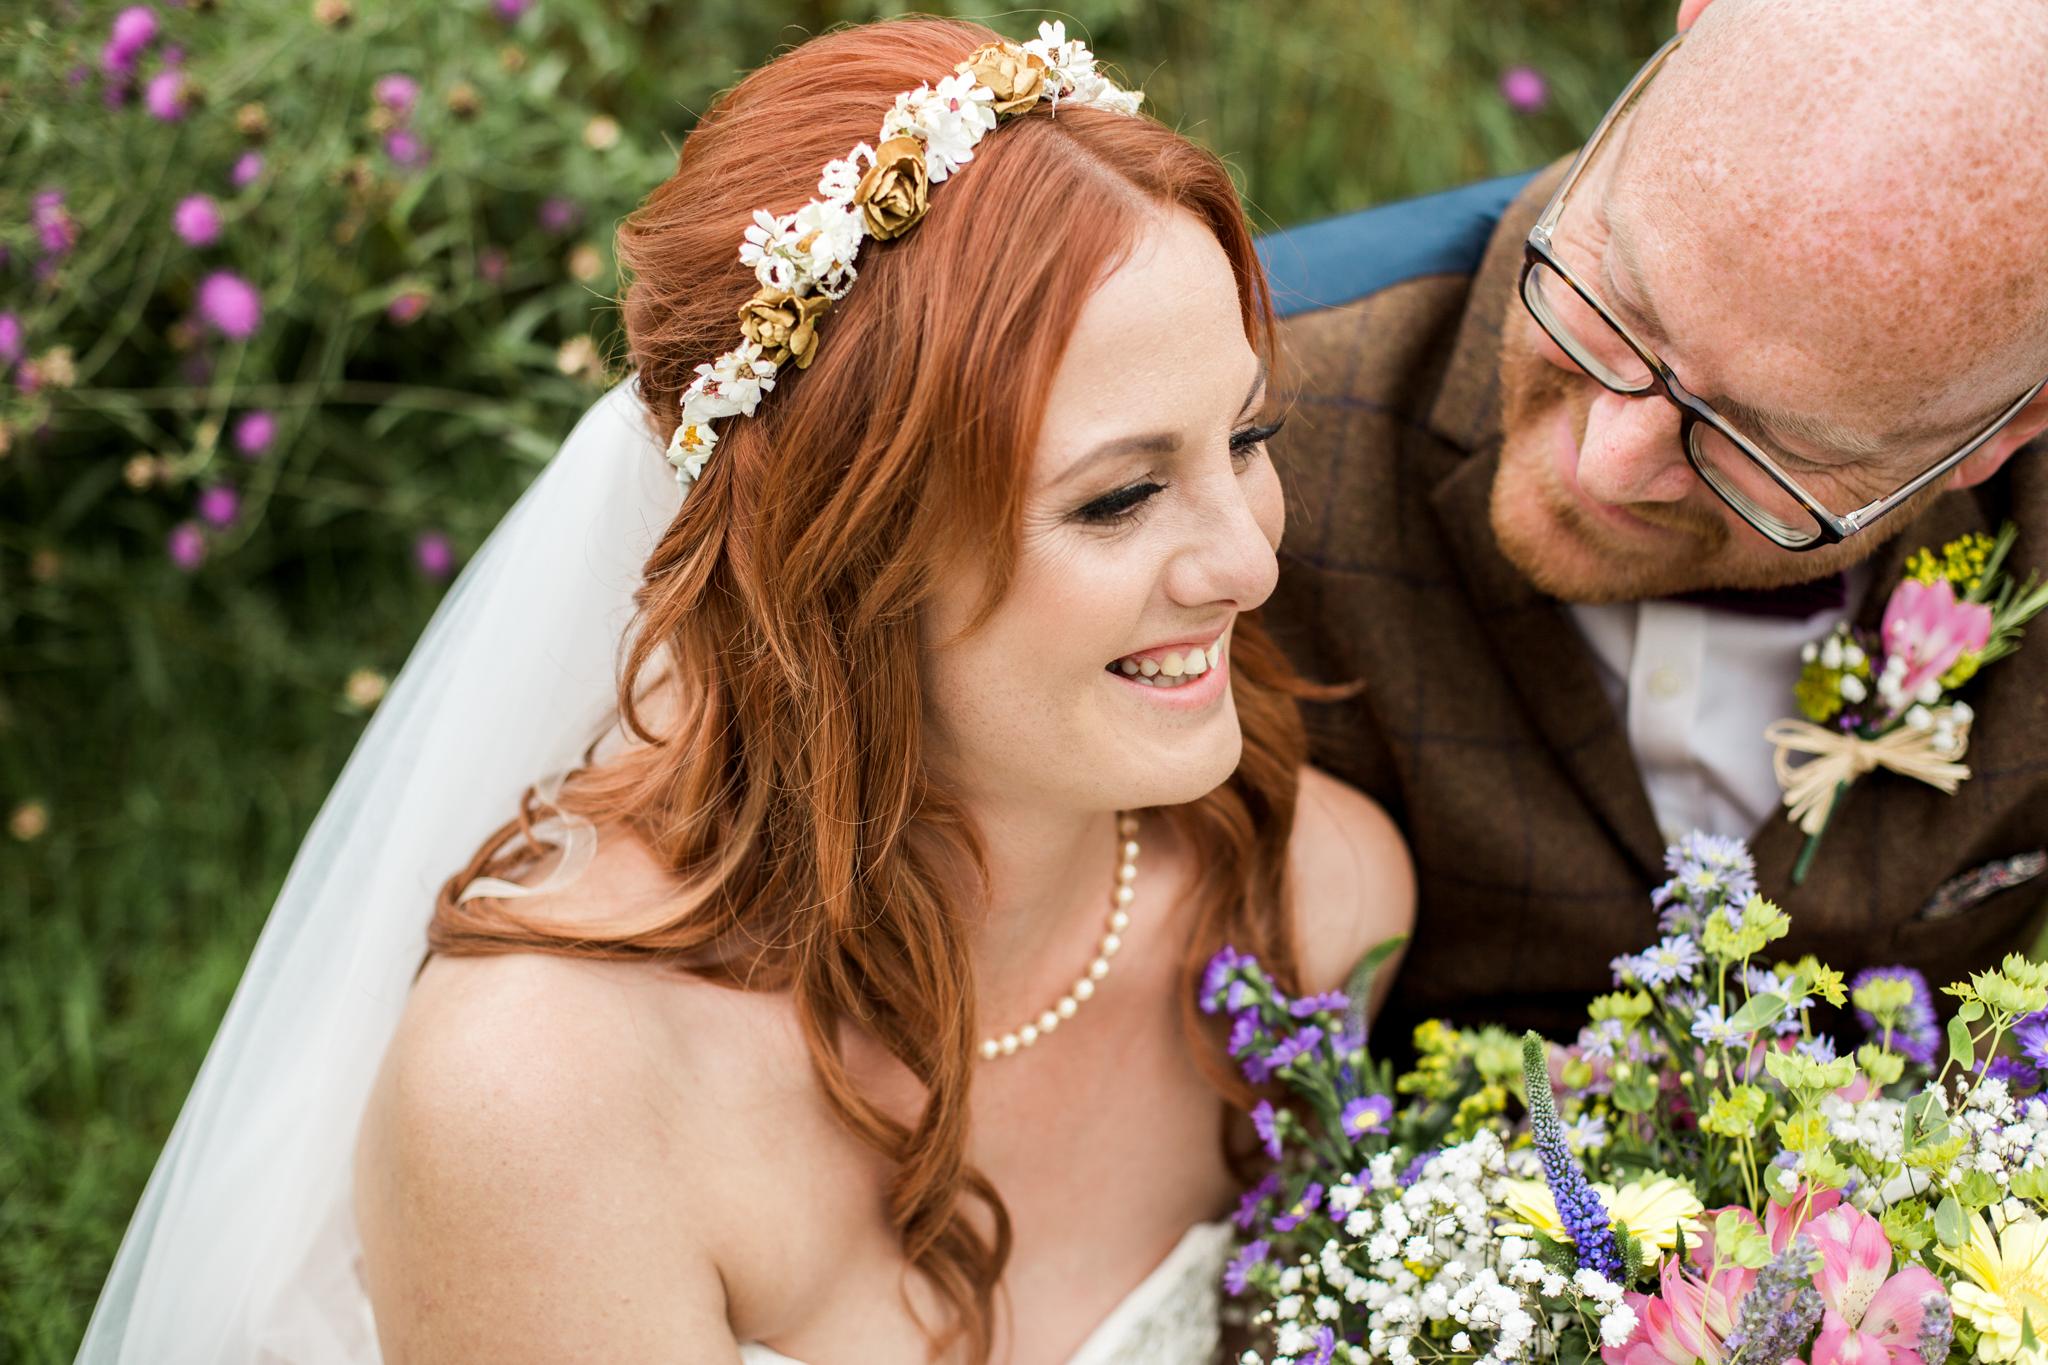 Rowsie & Lee, Swallows Nest Barn Wedding, Cotswold wedding photographer, Warwickshire Wedding Photographer-82.jpg